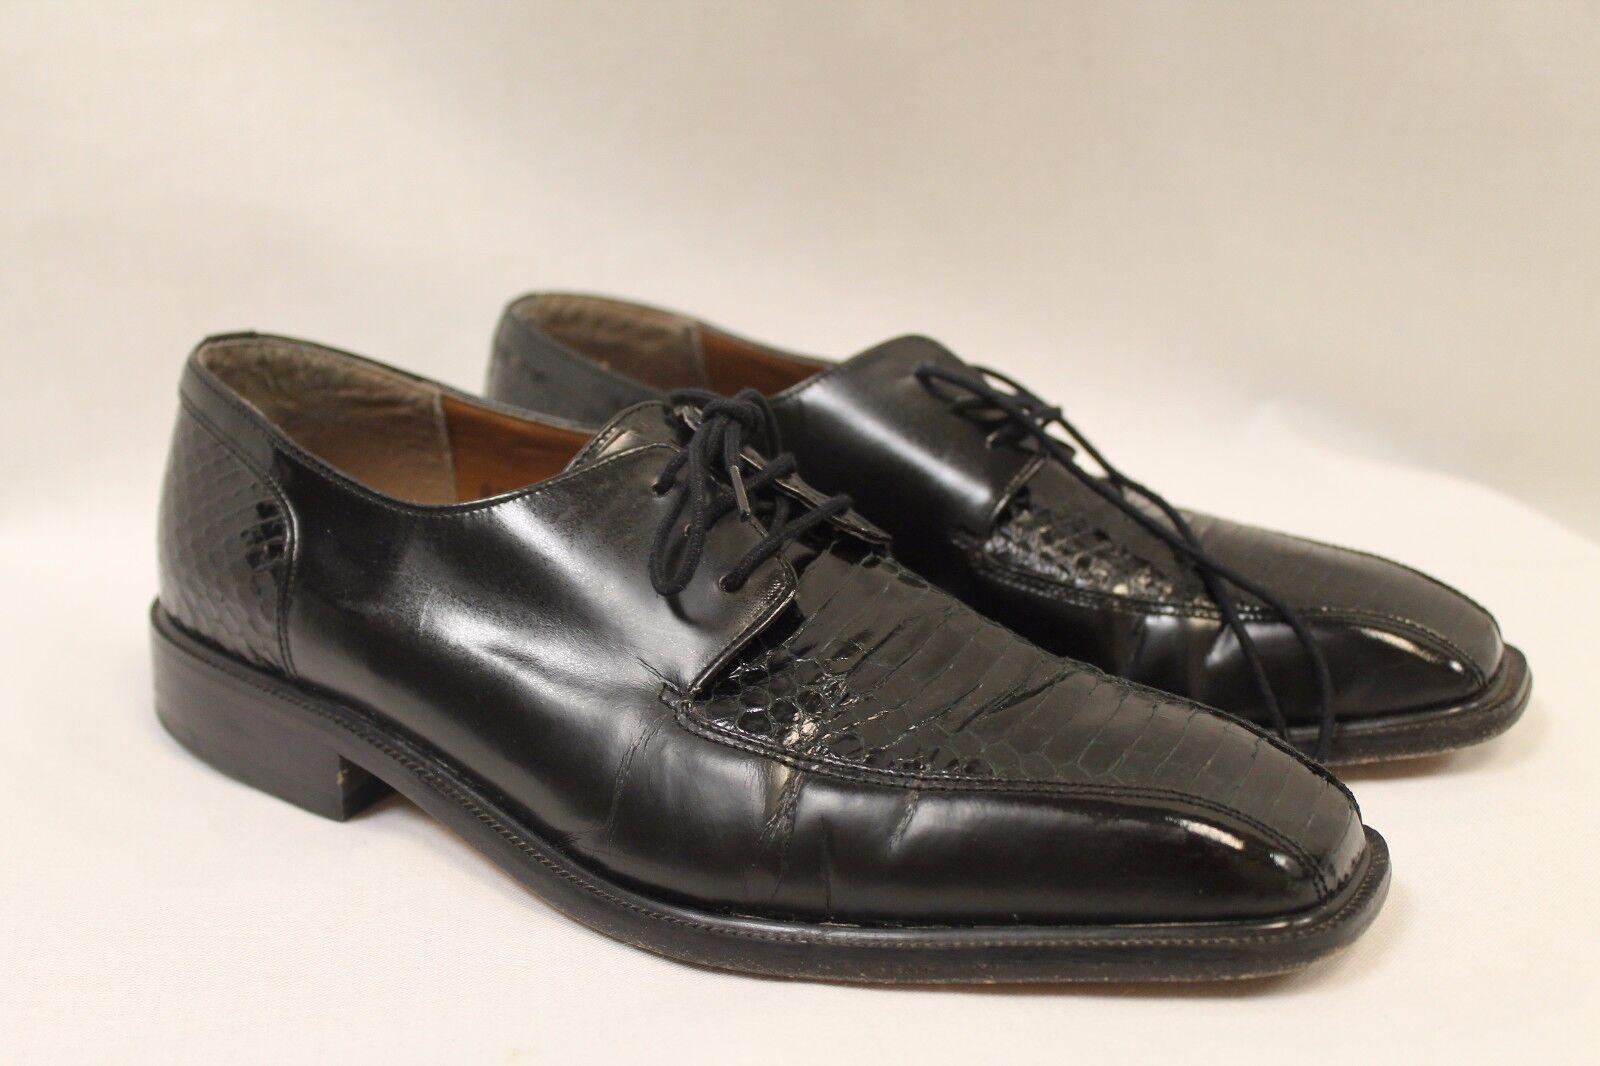 Giorgio Brutini Black Leather Genuine Snakeskin Men's shoes Size 9M